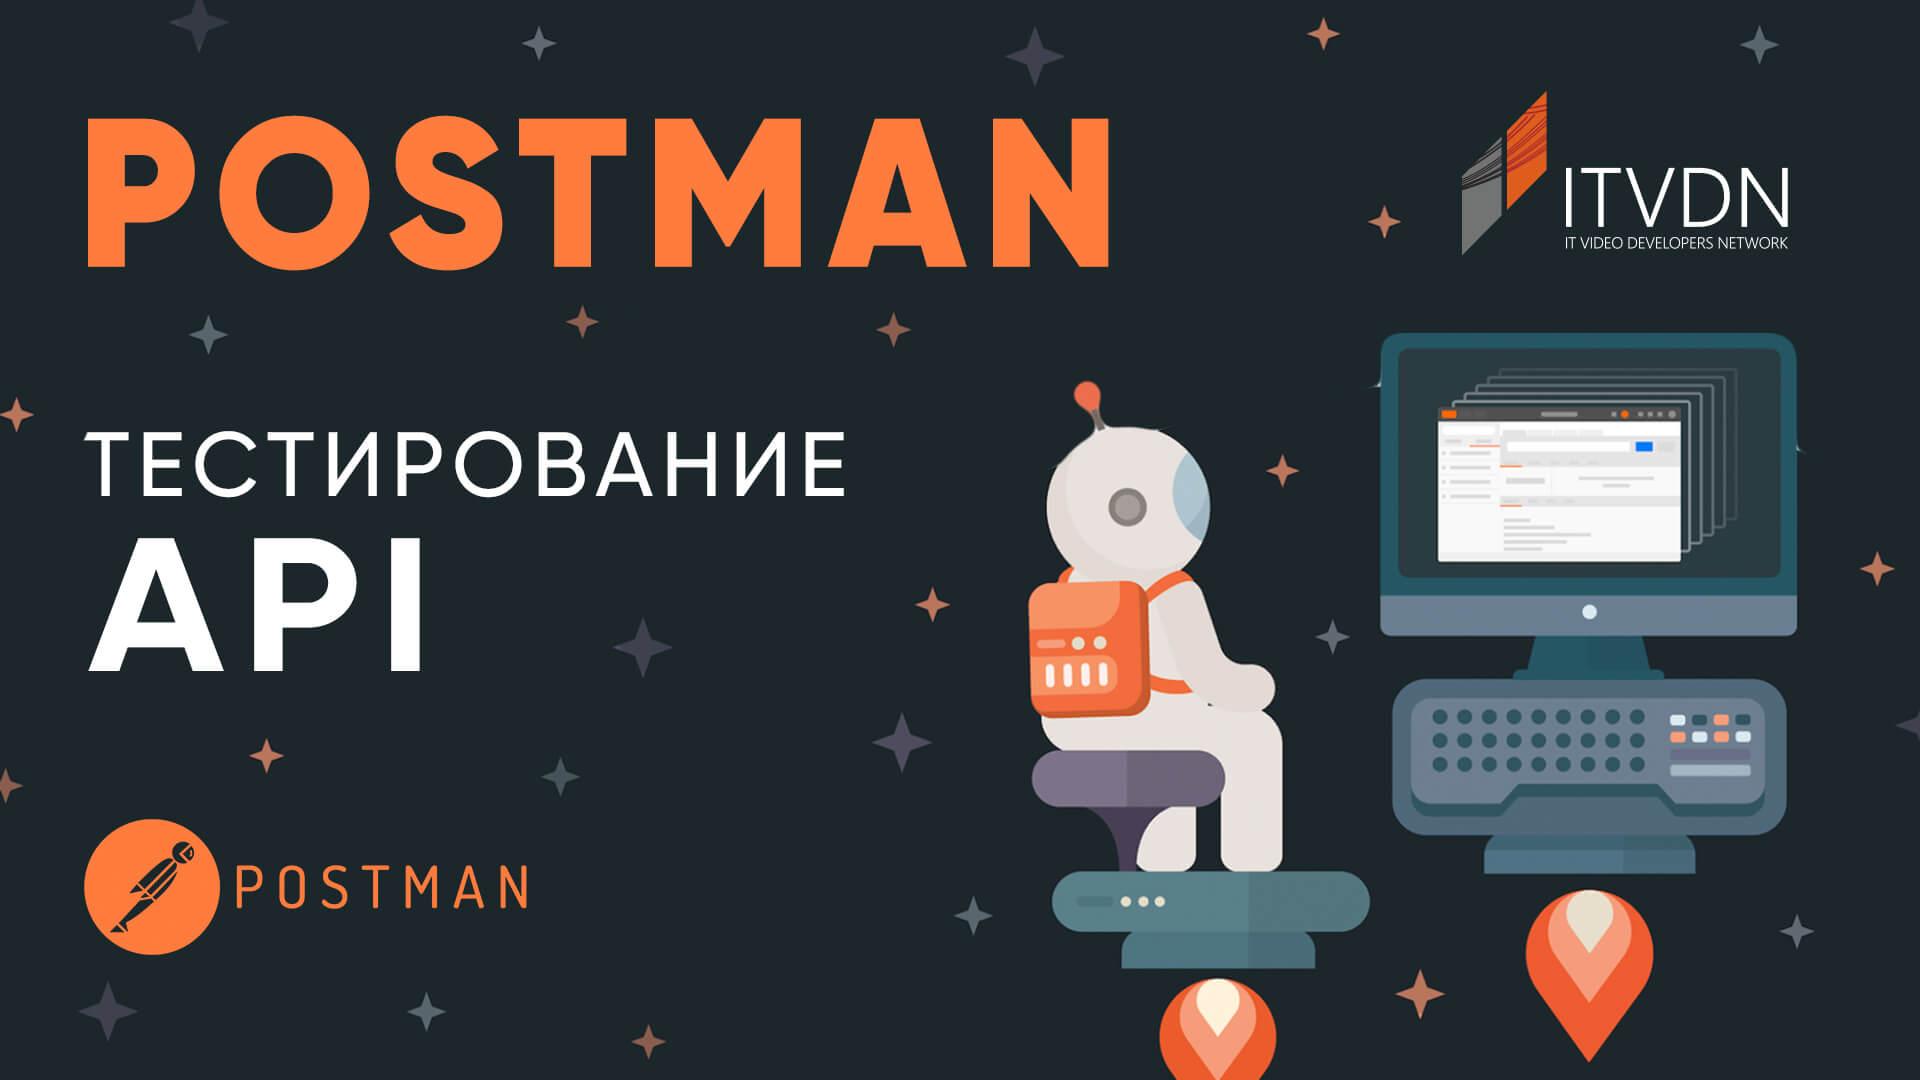 Обложка вебинара Postman. Тестирование API.